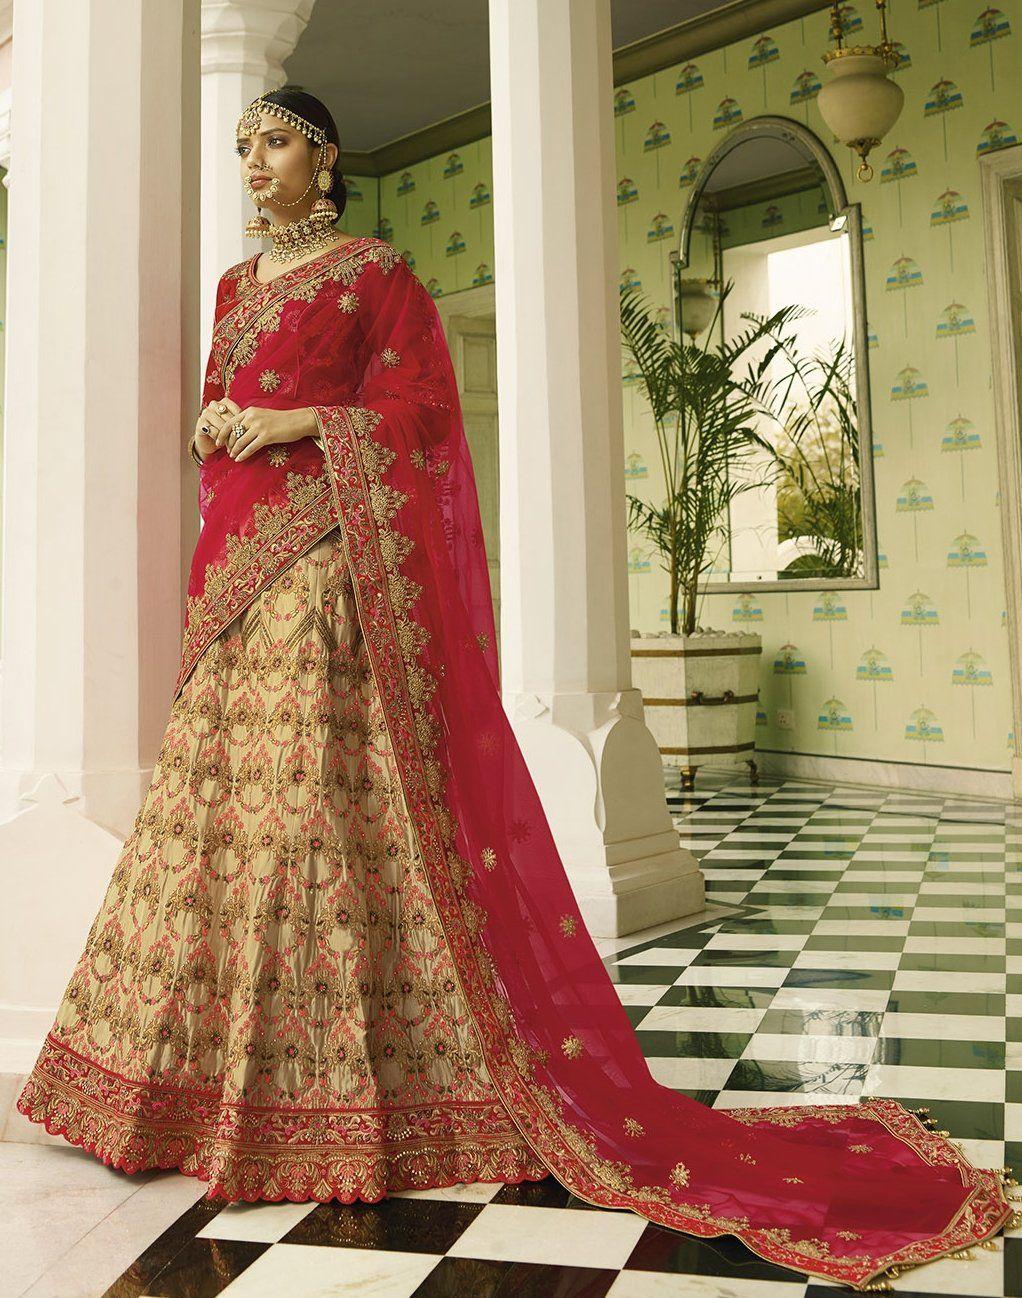 4ebffa8bd79470 ... #WorldwideShipping #online #shopping Shop on international.banglewale.com,Designer  Indian Dresses,gowns,lehenga and sarees , Buy Online in USD 365.84